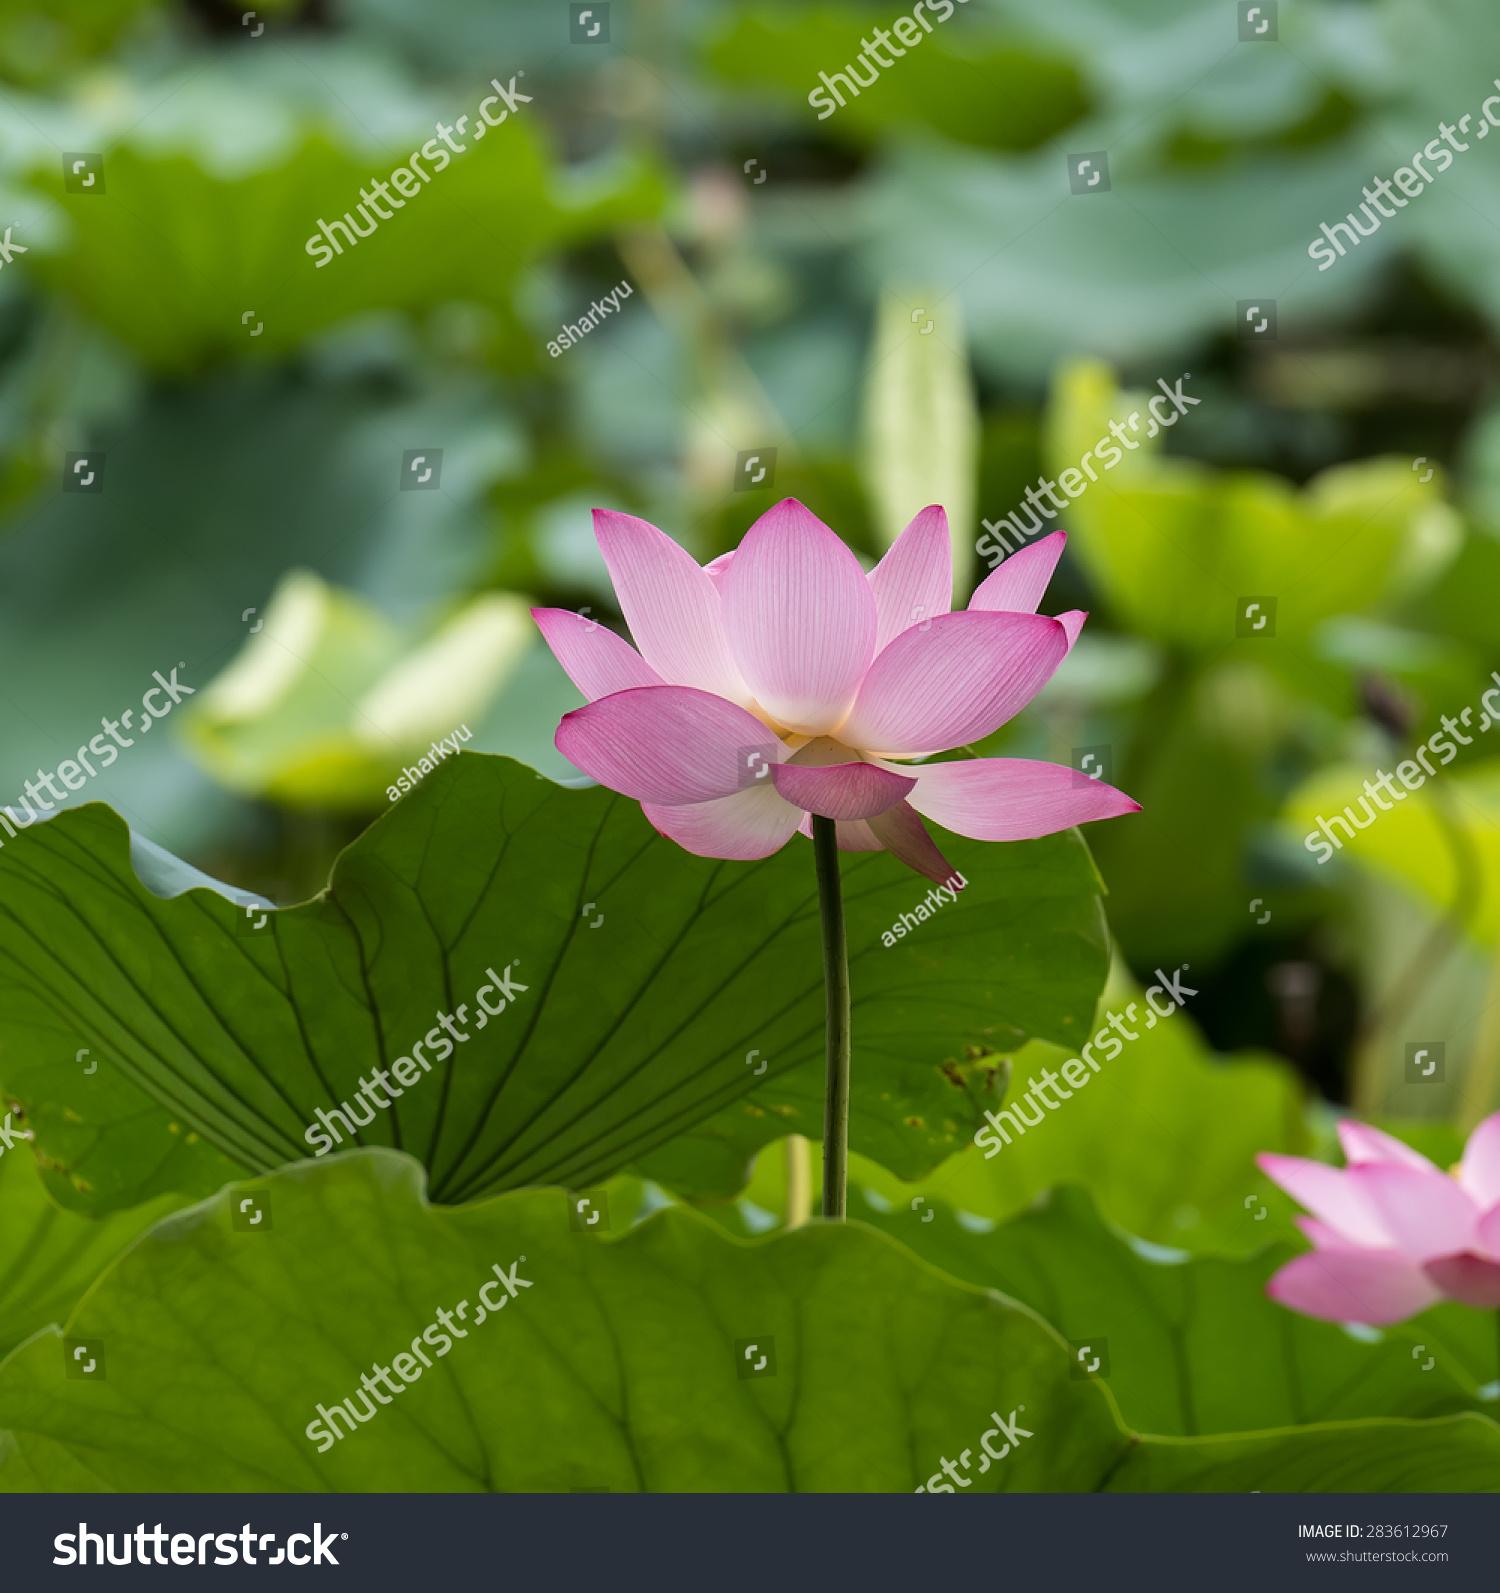 Pink lotus flower beautiful lotus stock photo edit now shutterstock pink lotus flower beautiful lotus izmirmasajfo